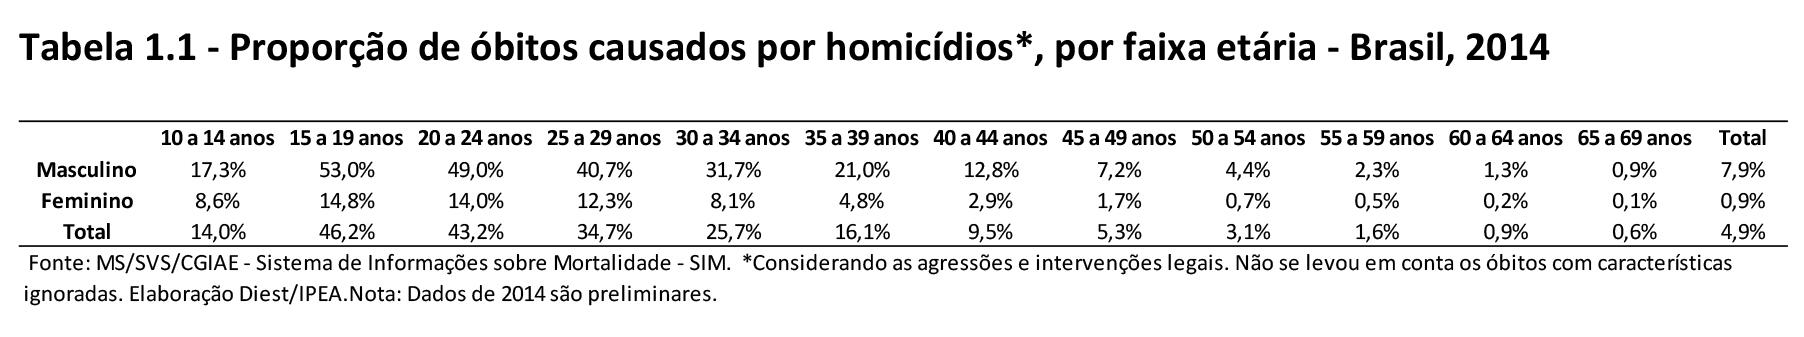 IPEA_FBSP_AtlasViolencia2016_homicidiosporsexo